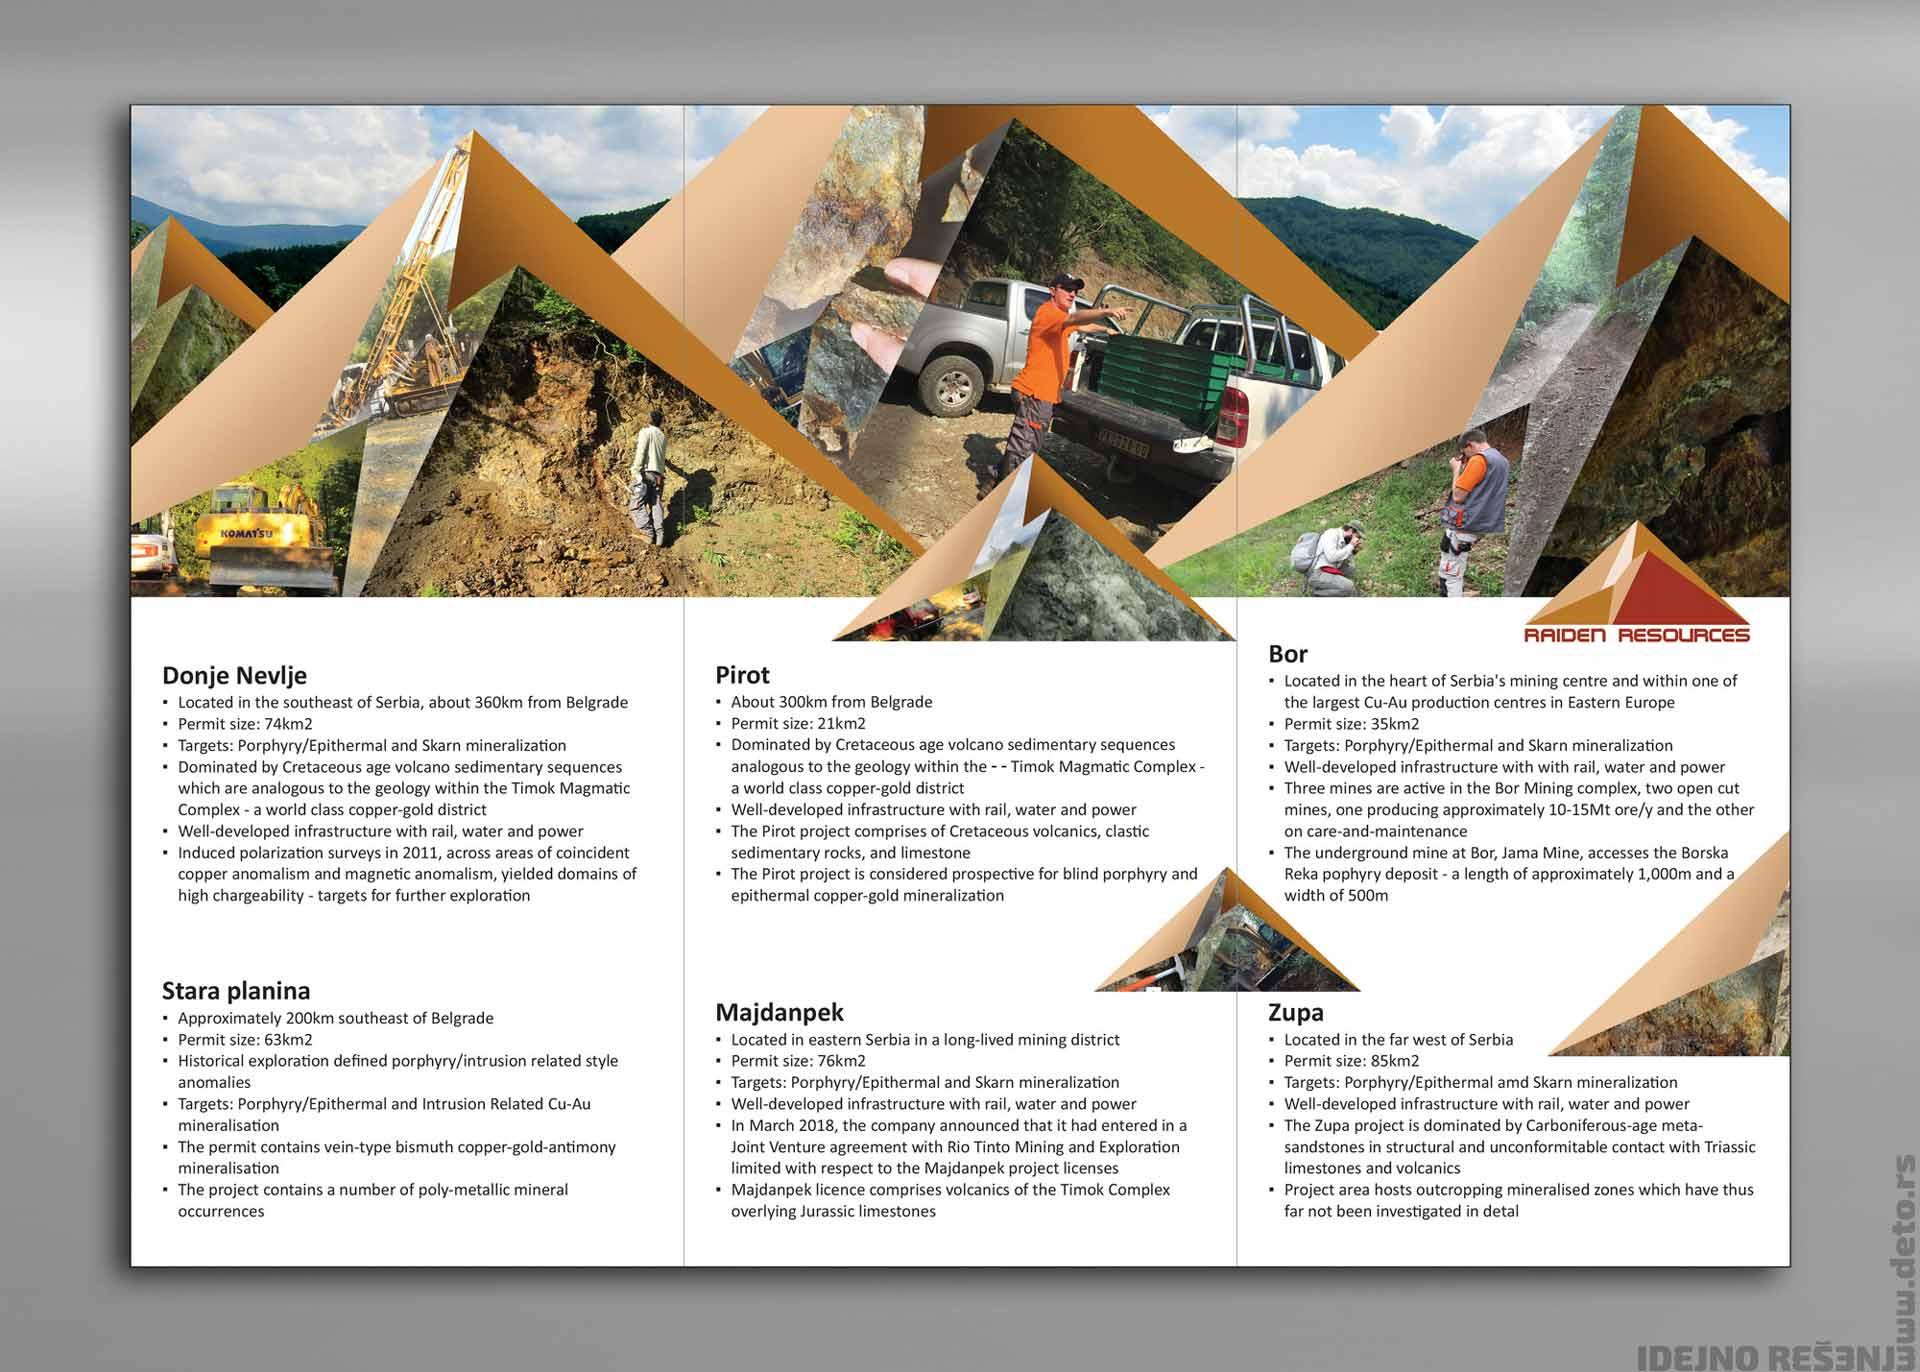 Dizajn - Idejno rešenje flajera A4 (b) / Raiden resources (Australija)